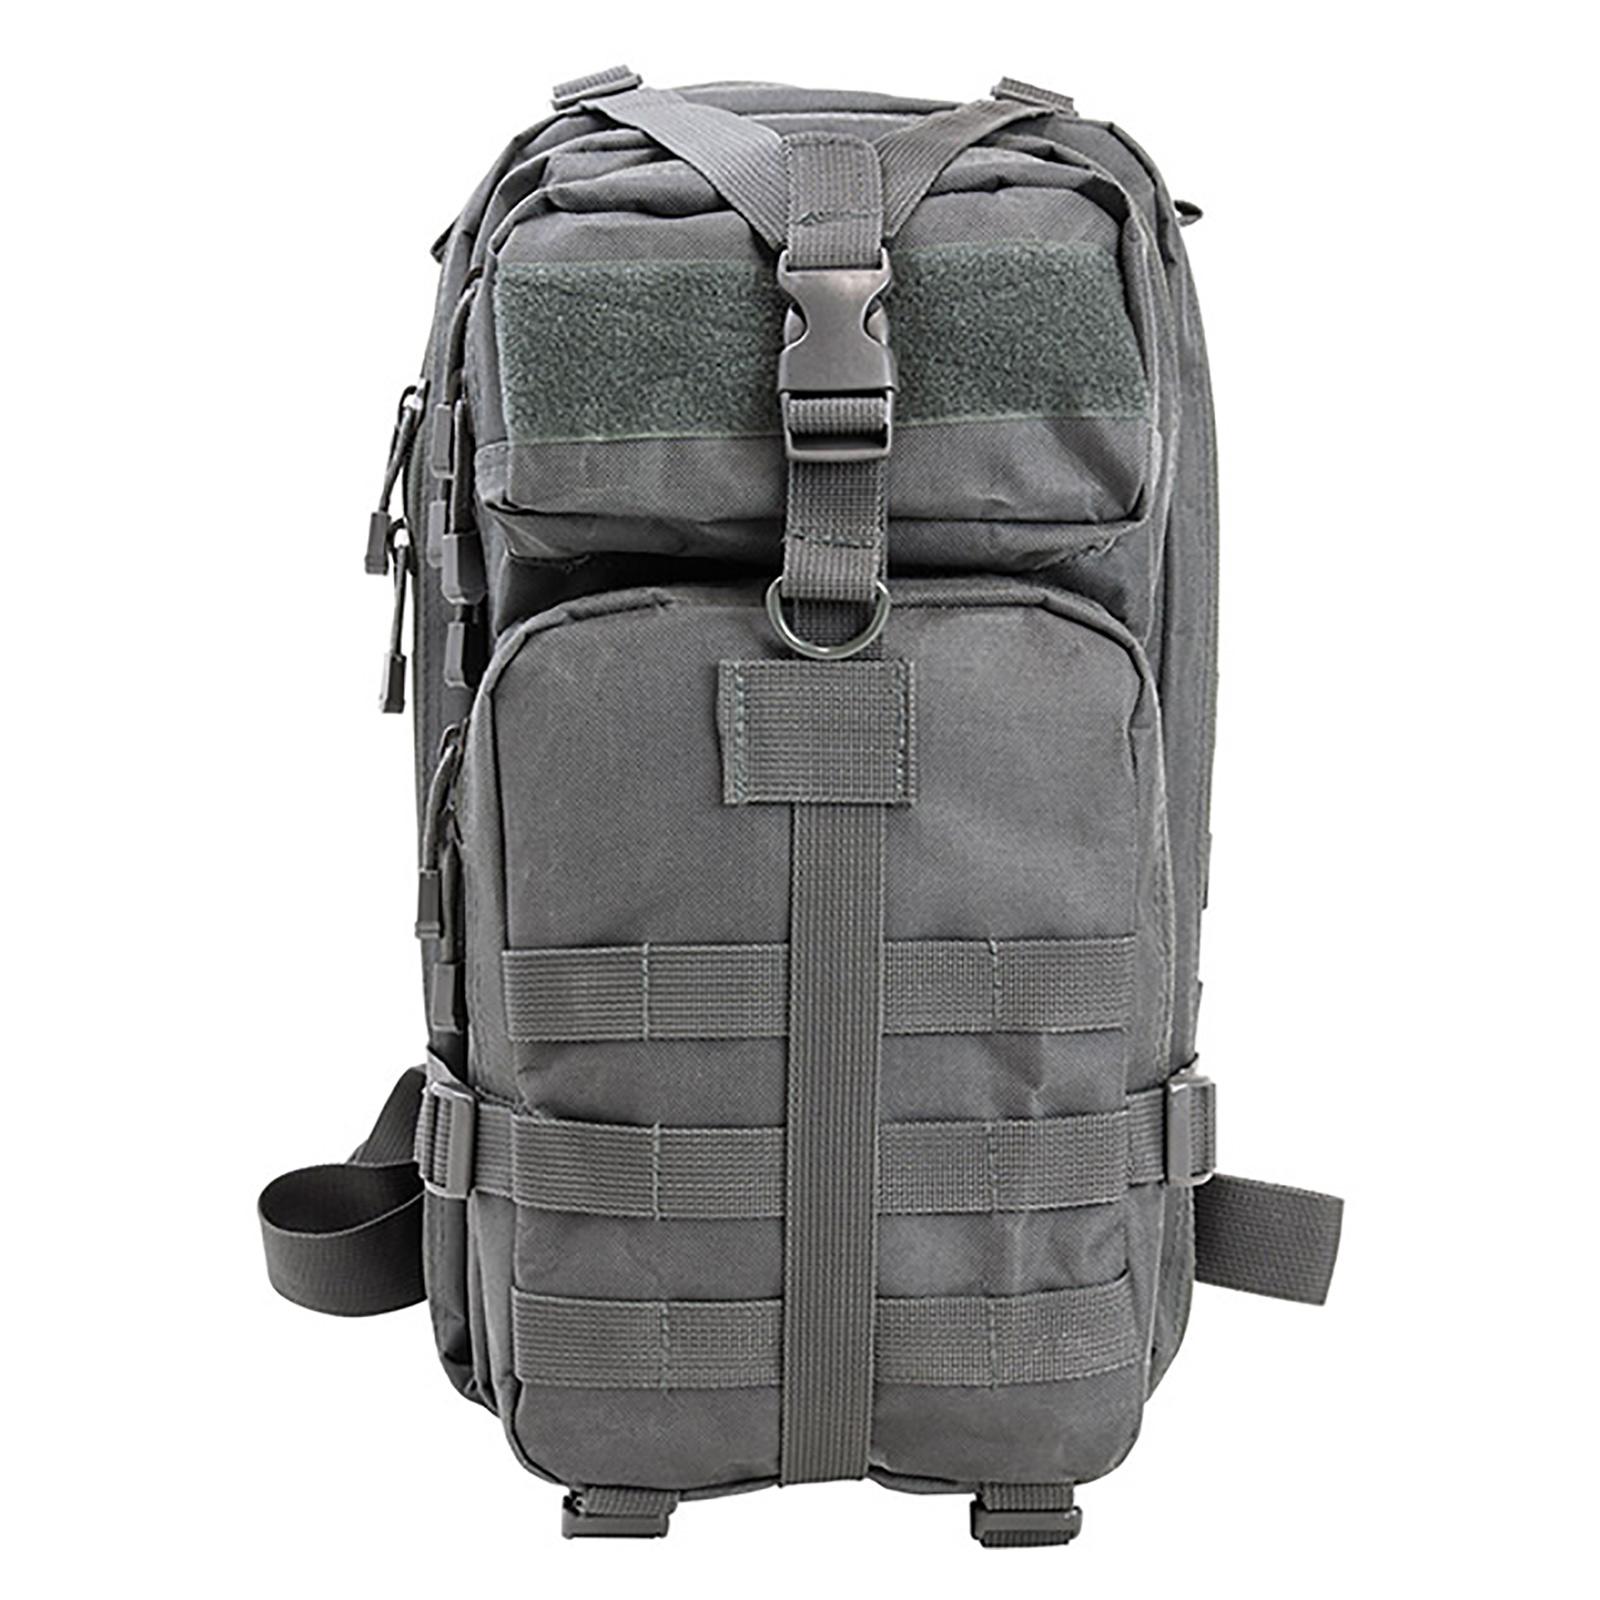 nc-star-small-backpack-ugry